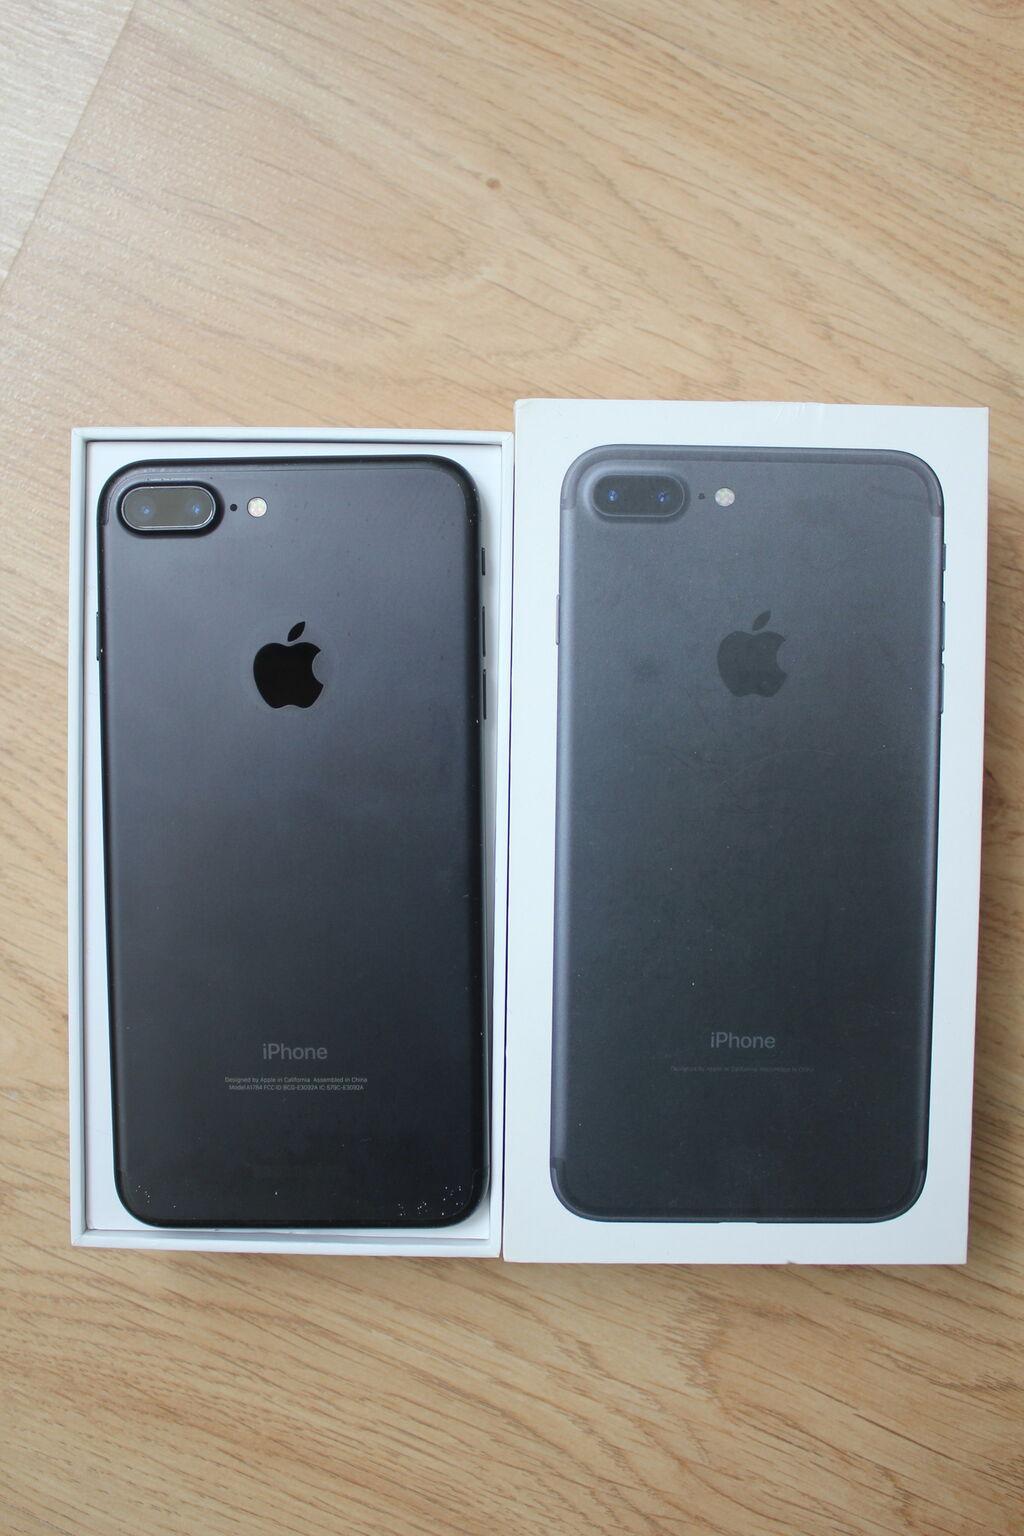 IPhone 7 Plus | 128 ГБ | Черный | Б/У: IPhone 7 Plus | 128 ГБ | Черный | Б/У